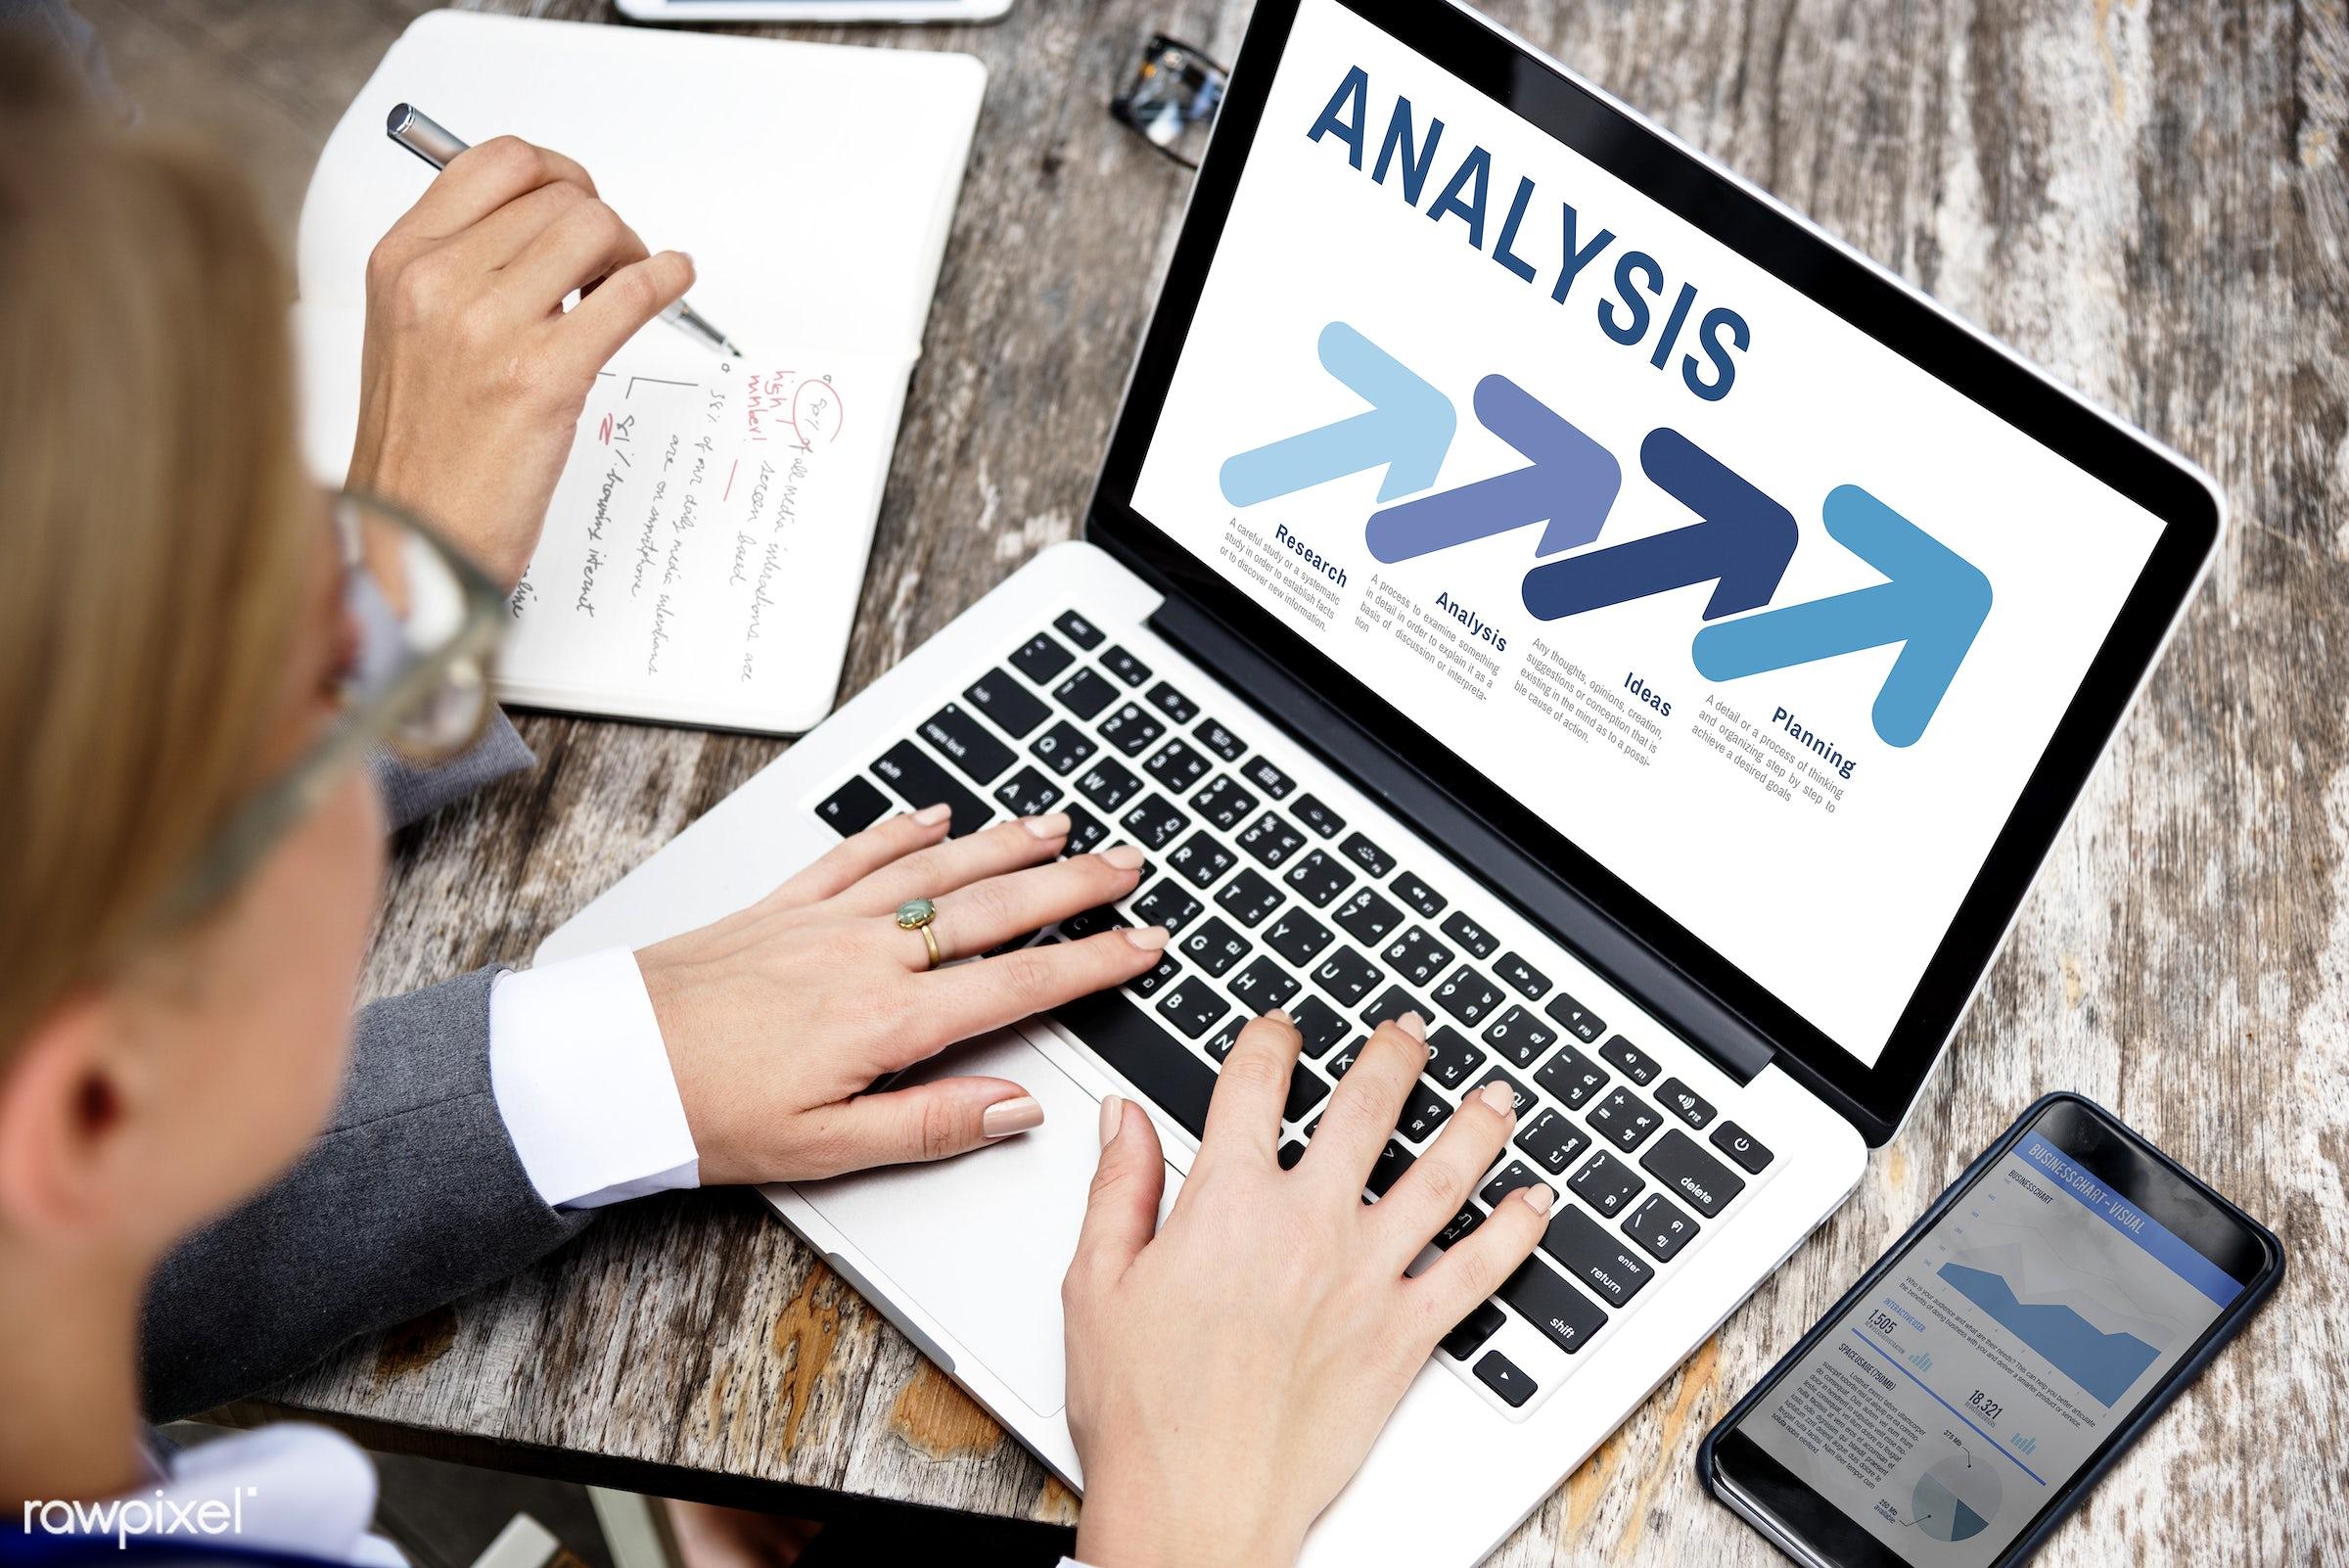 businessperson, aim, analysing, analysis, arrow up, branding, business, businesspeople, businesswoman, businesswomen,...